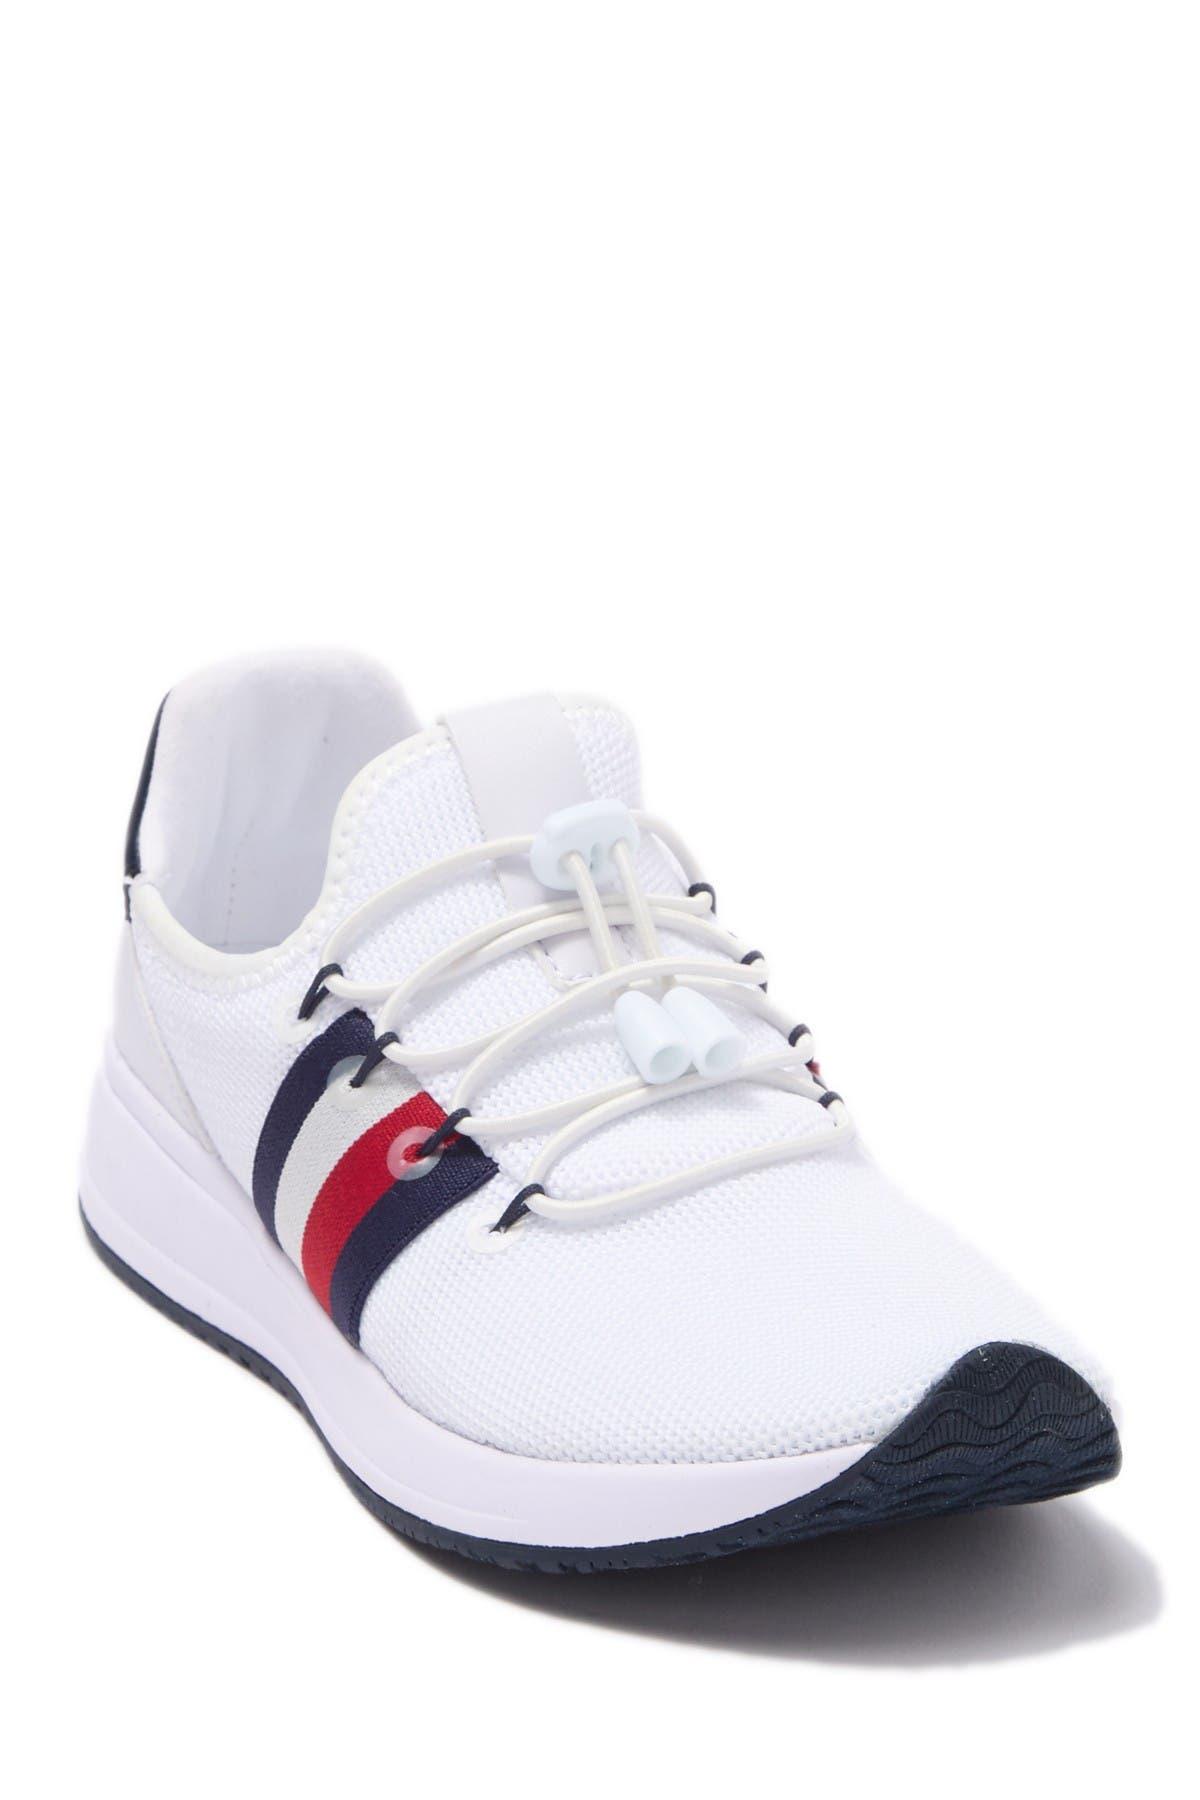 Tommy Hilfiger   Rhena Sneaker